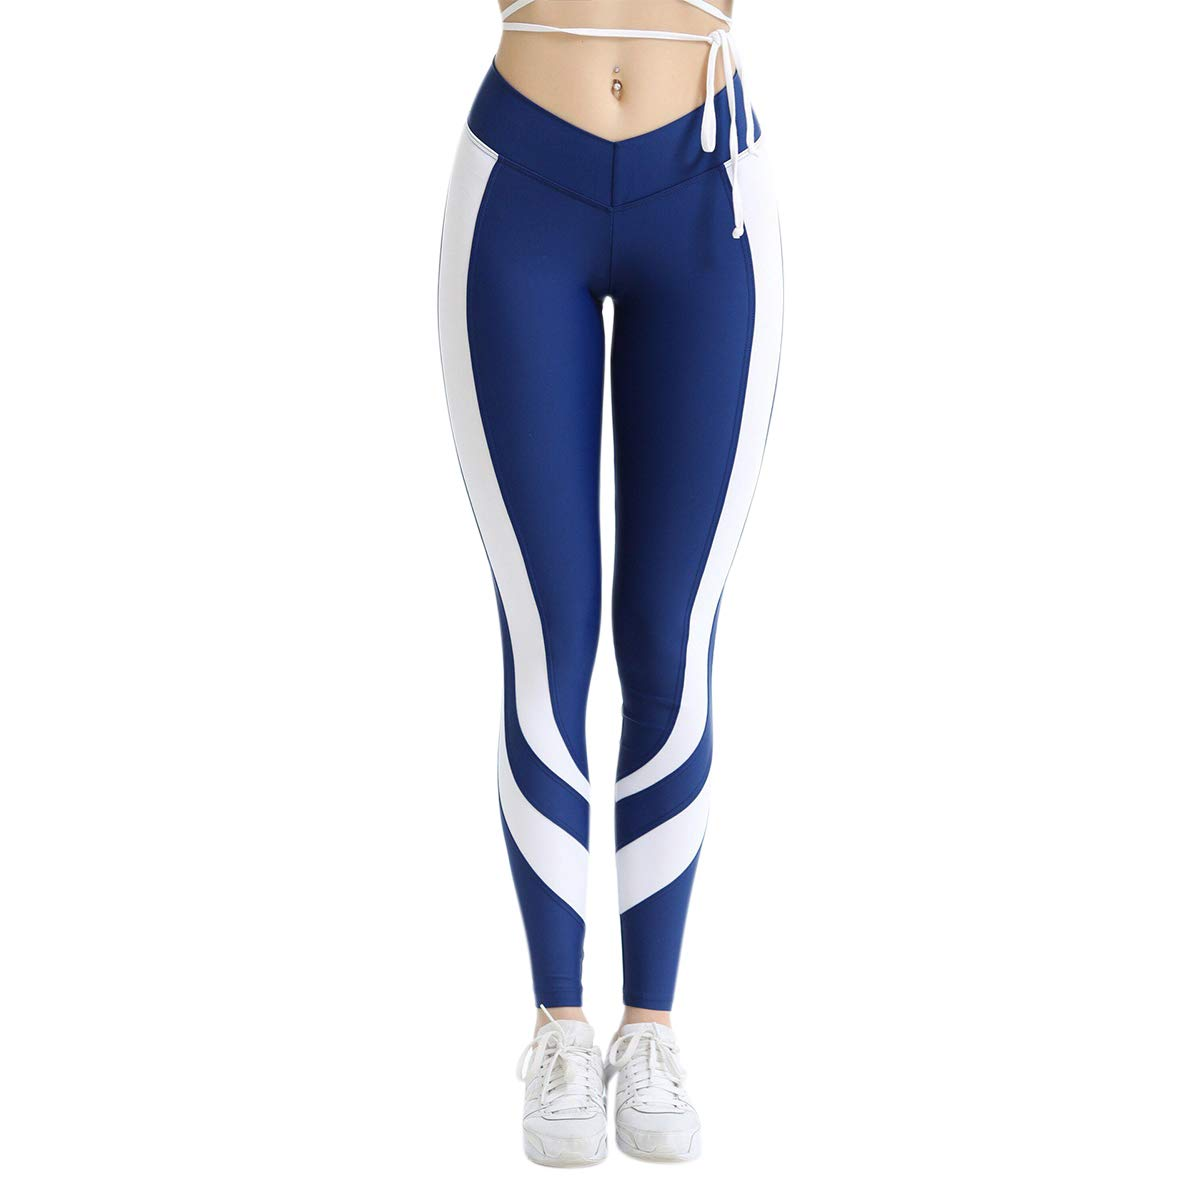 UWYHF High Waist Yoga Pants Love Heart Print Tummy Control ...